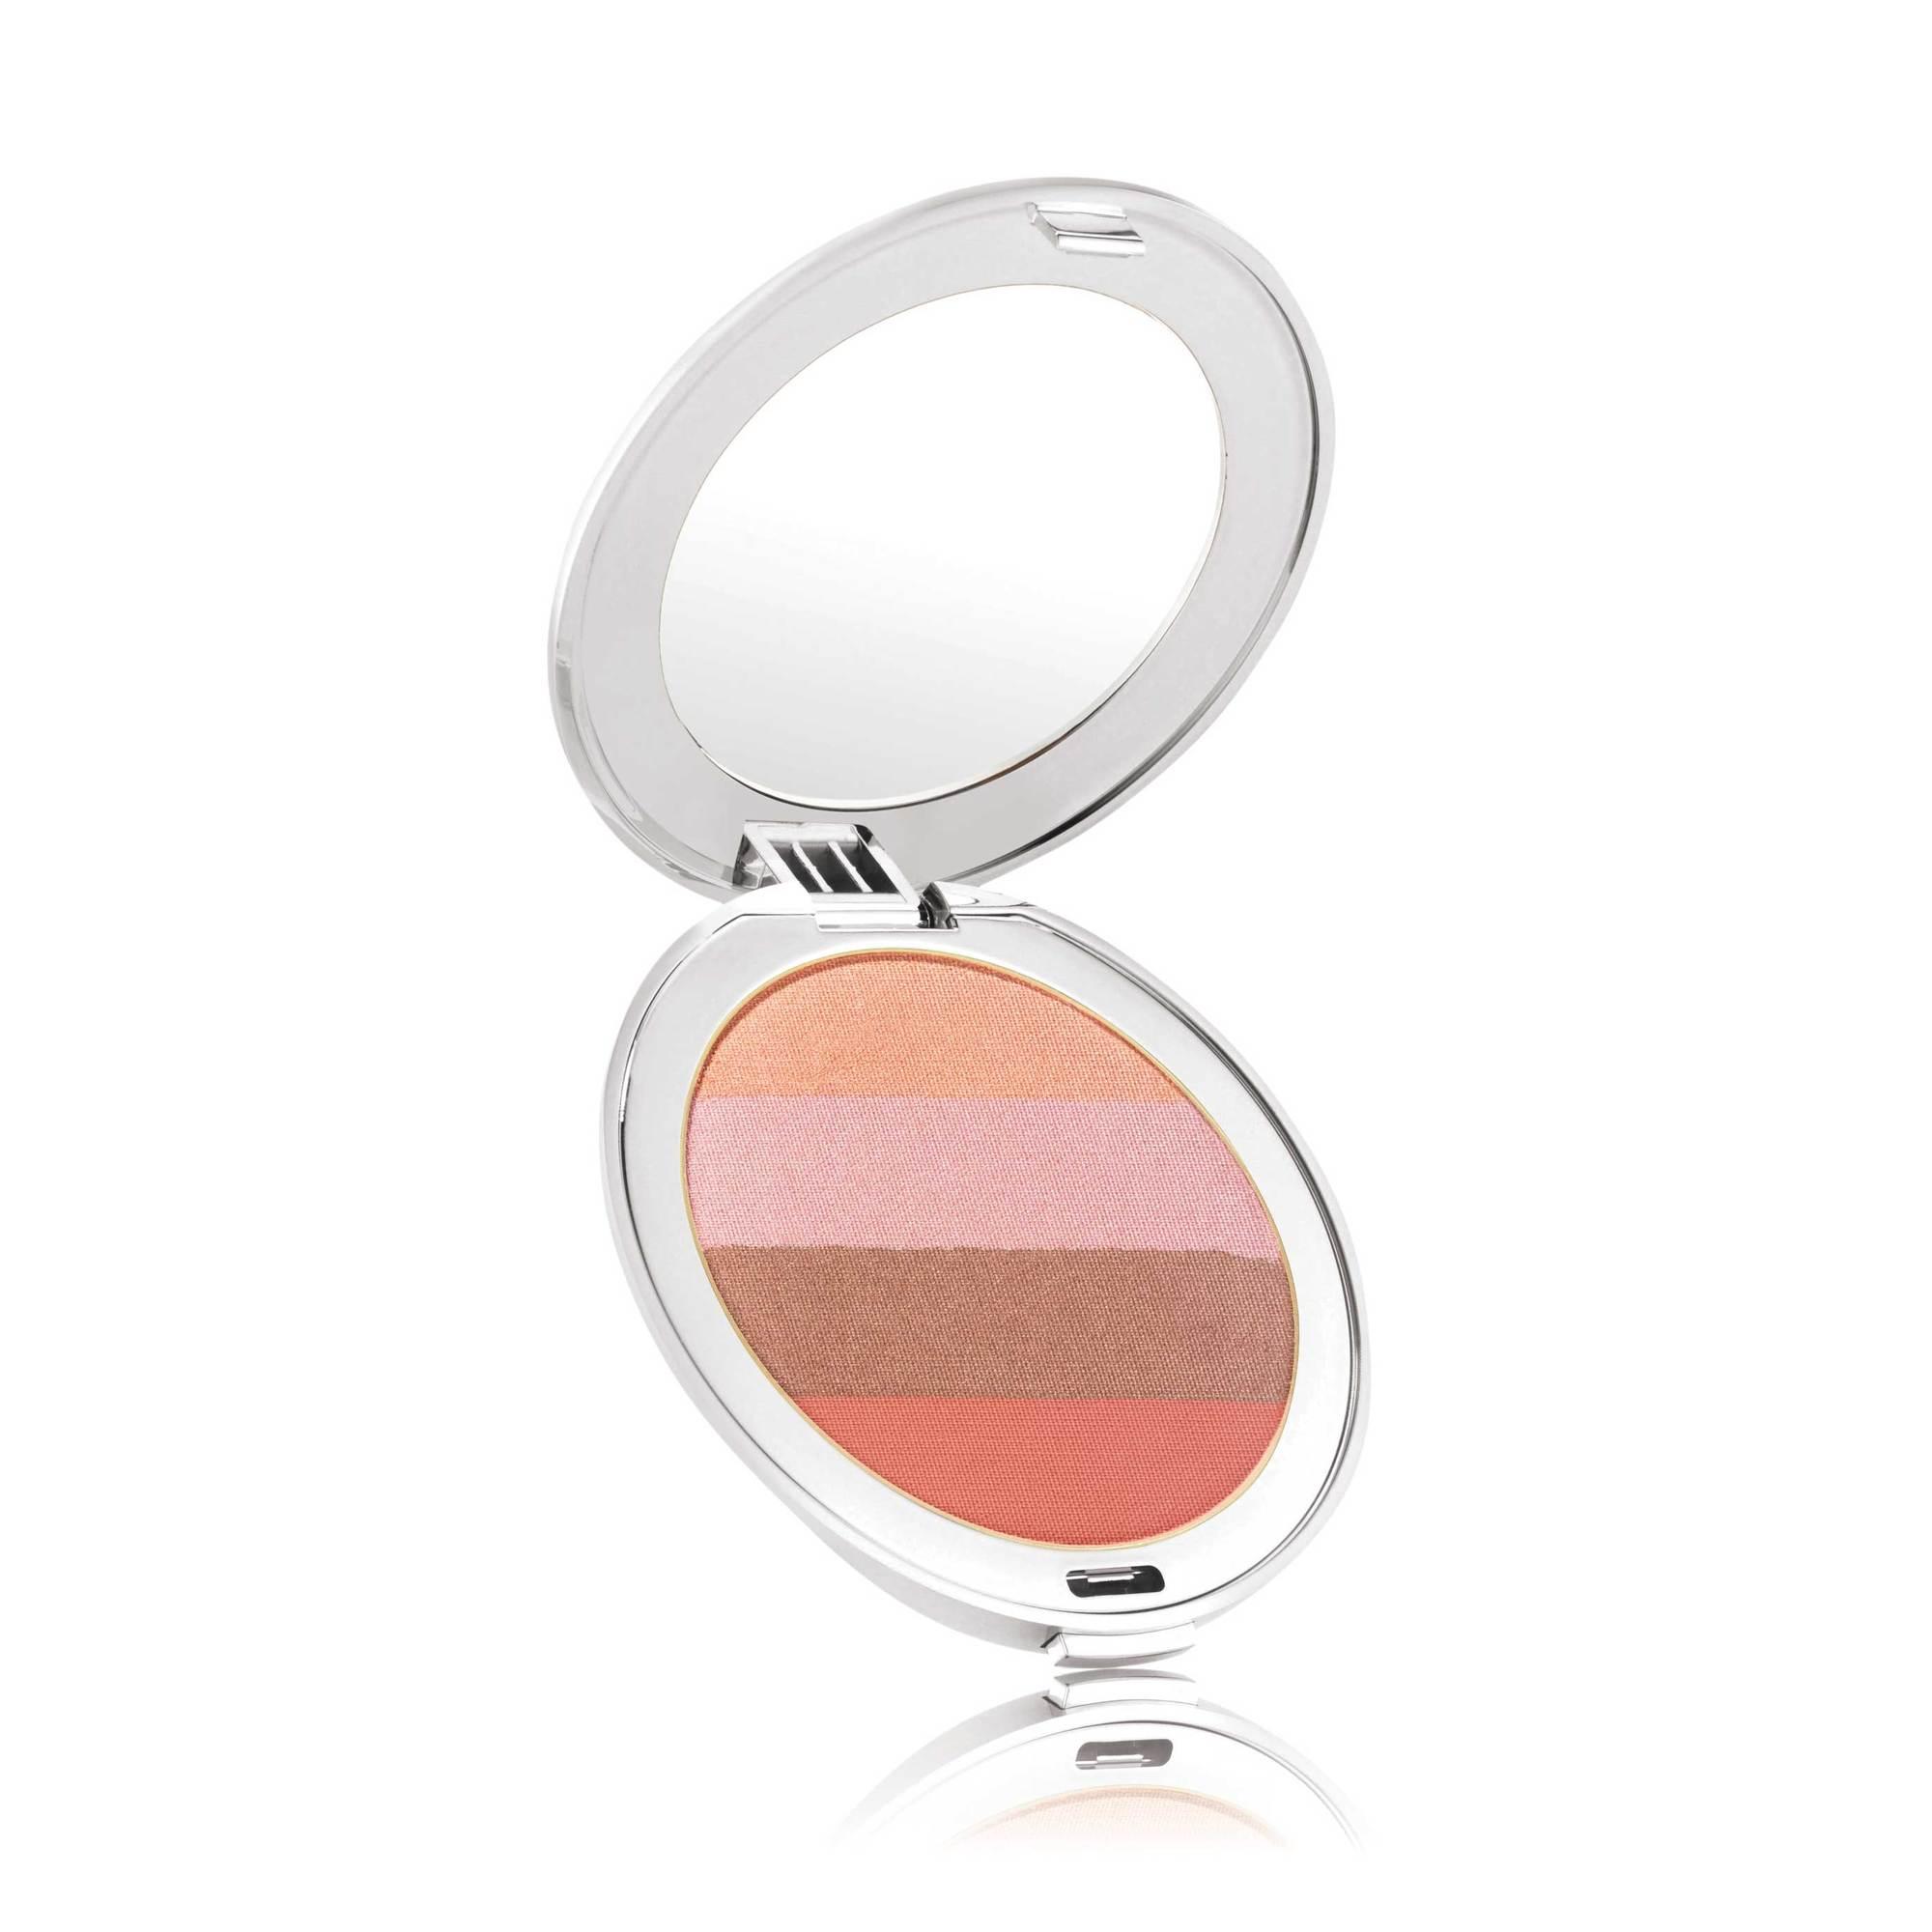 Bronzer - Peaches & Cream (warm peachy pink)